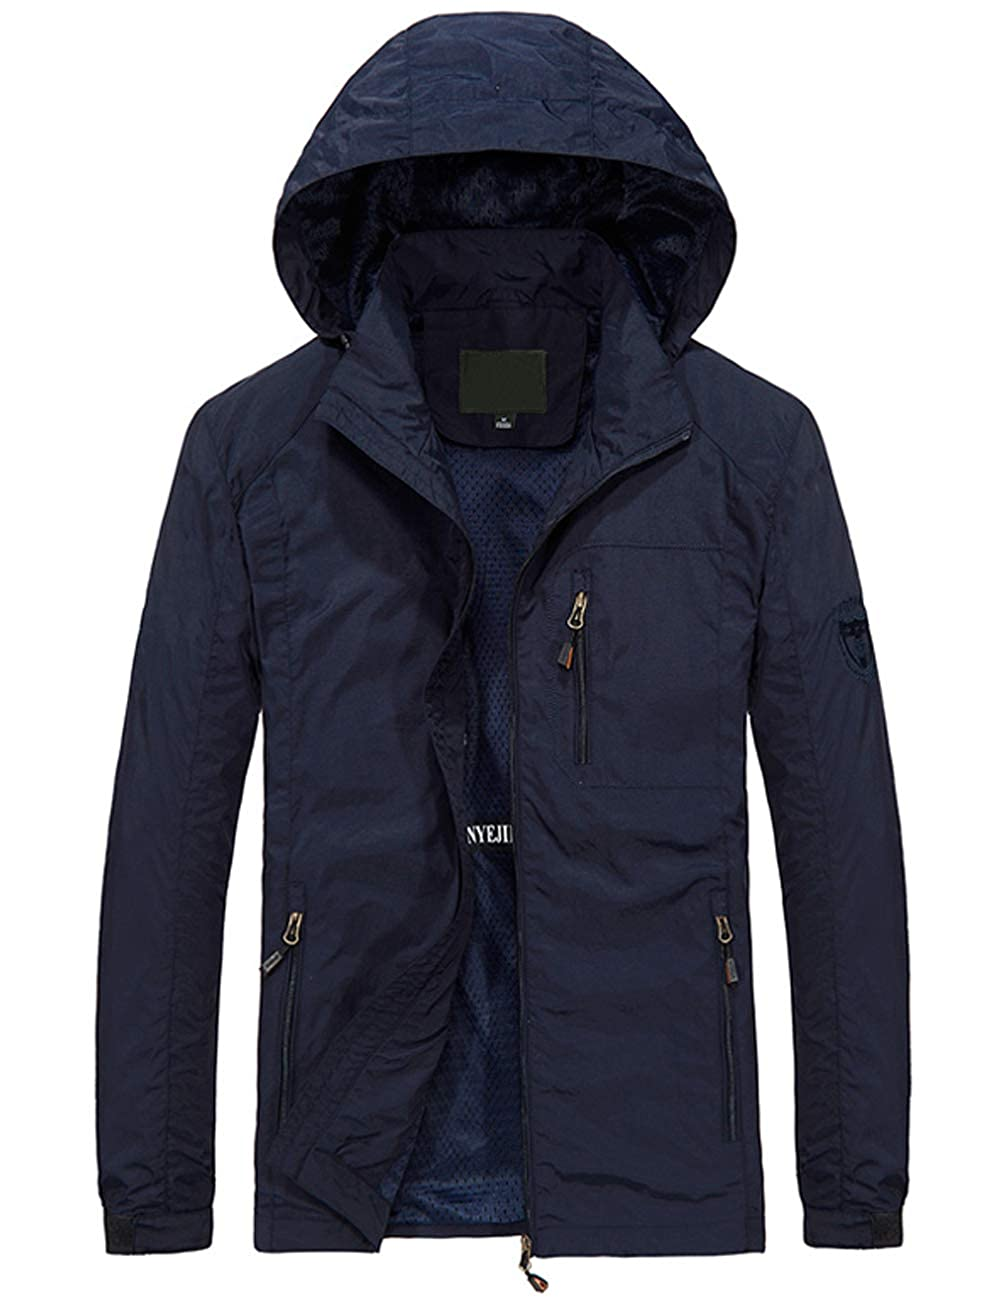 Pinkpum Mens Hooded Lightweight Windbreaker Jacket Softshell FY0219